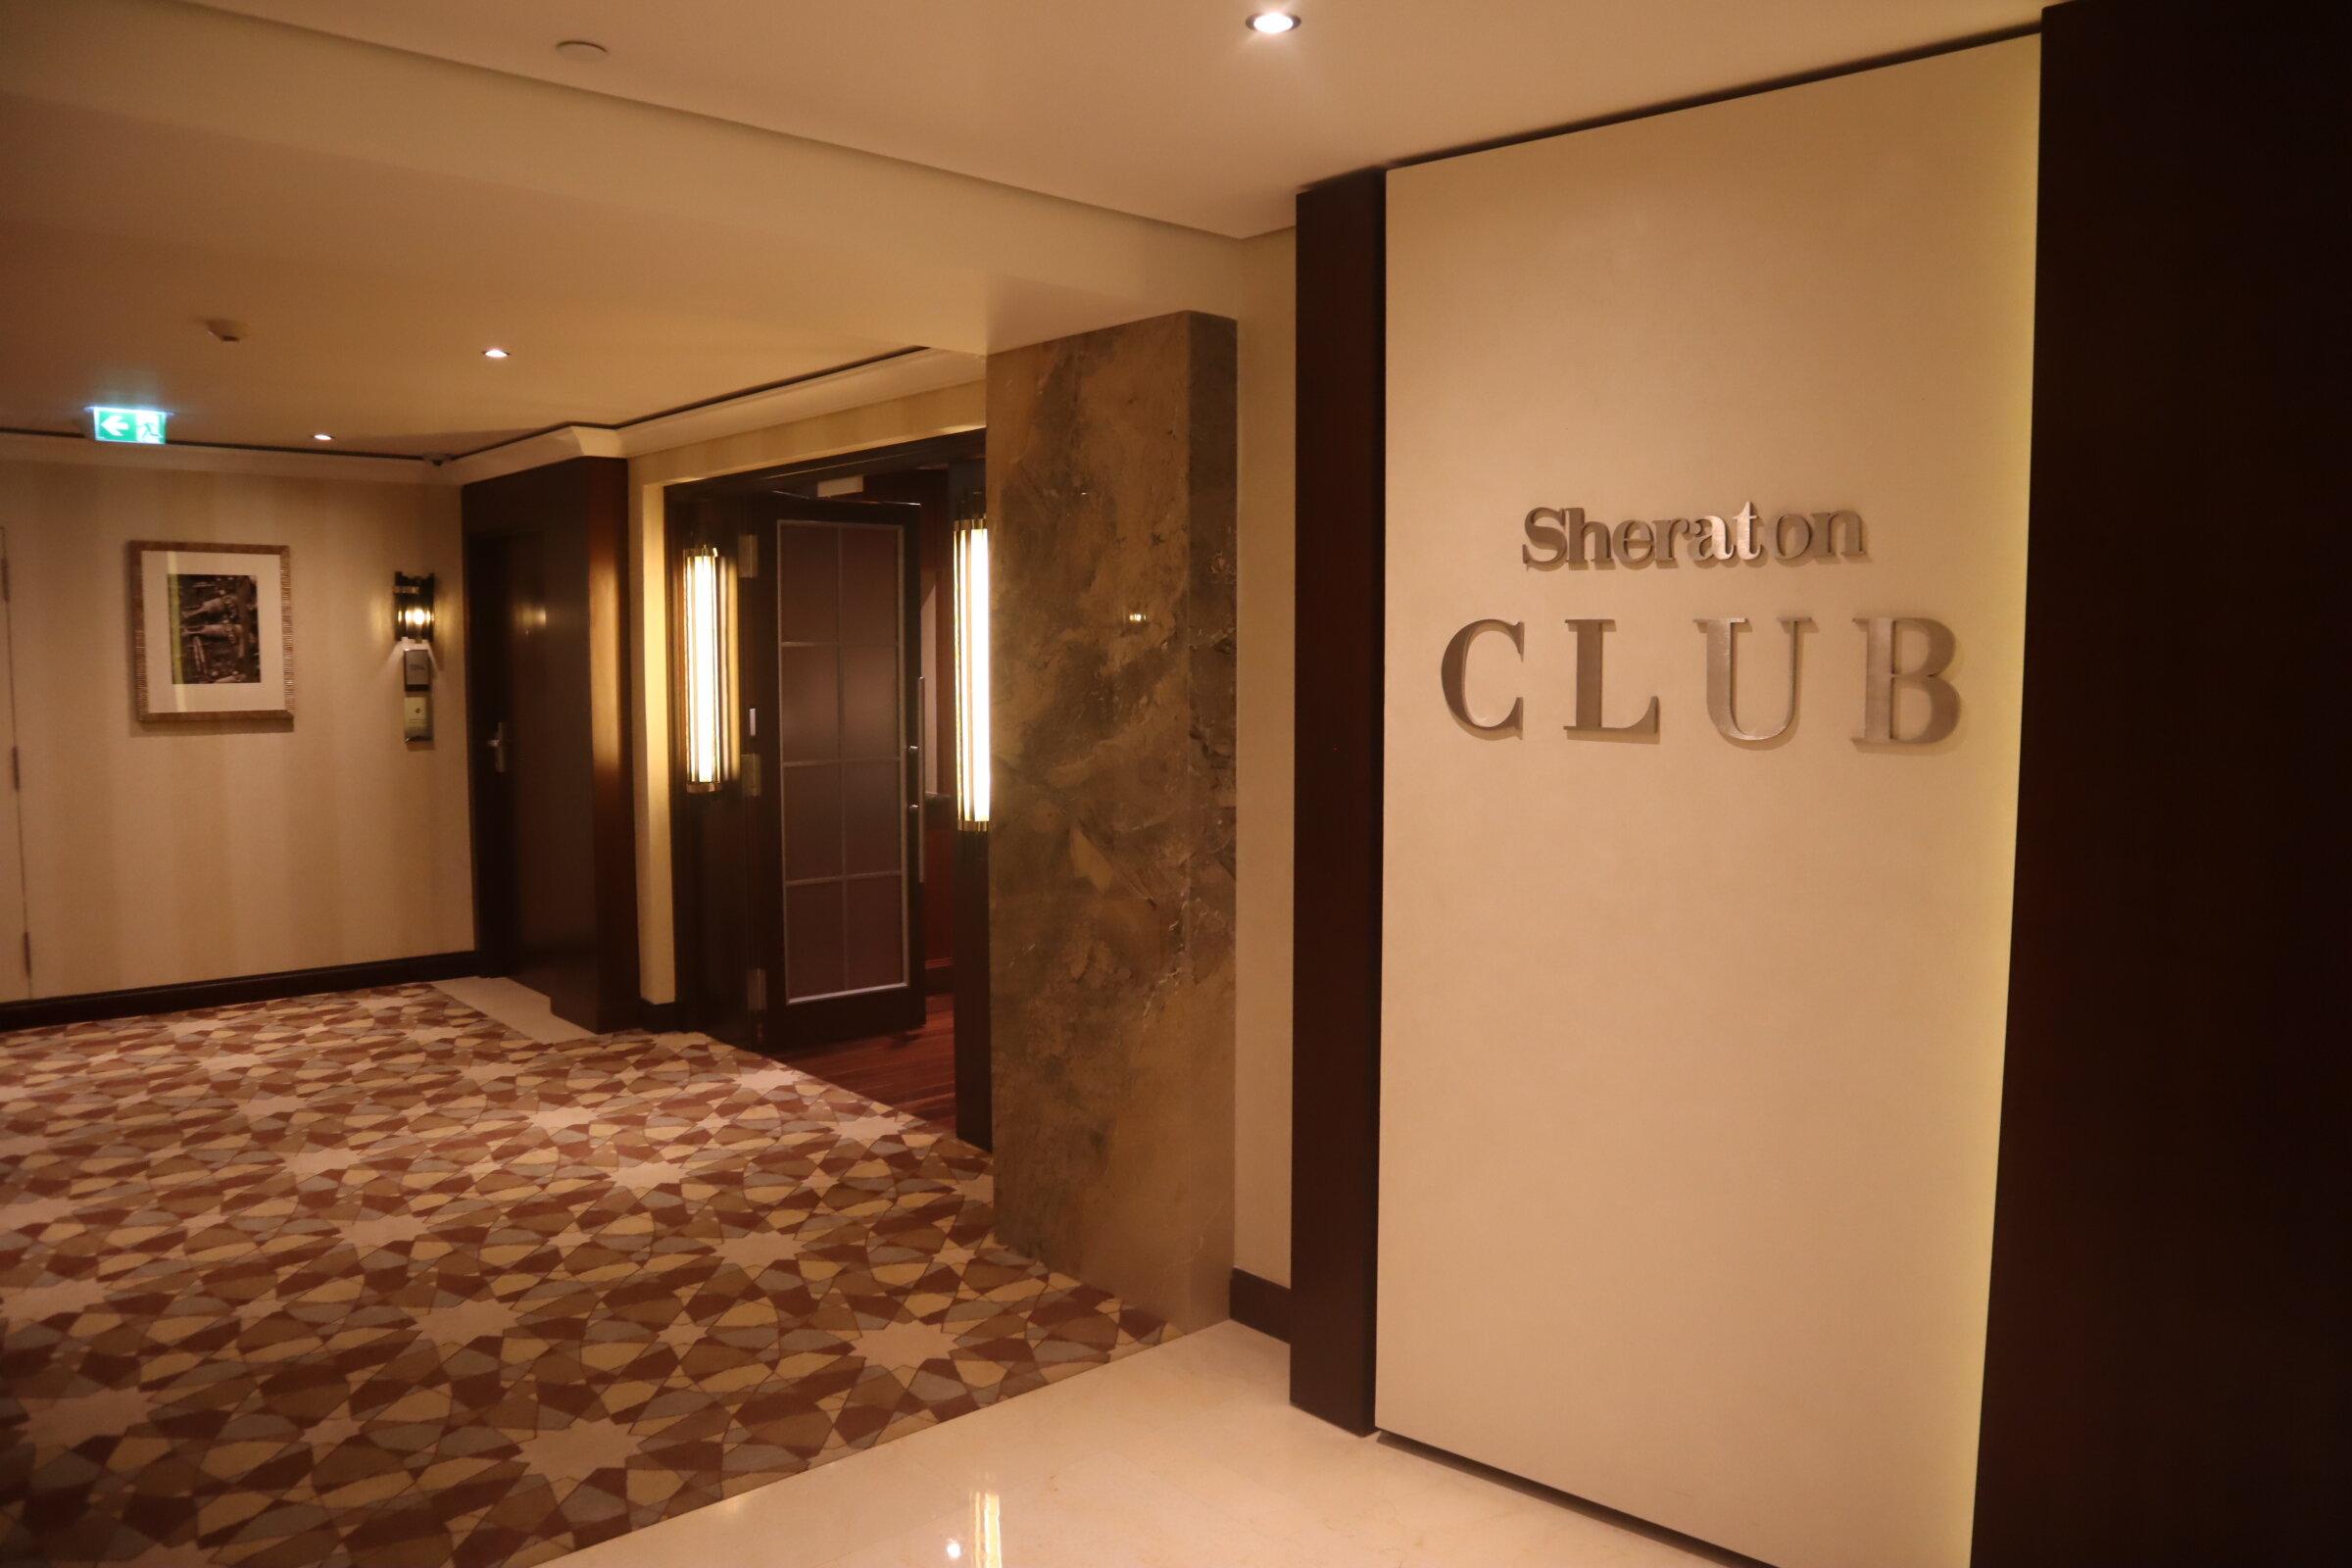 Sheraton Oman – Sheraton Club